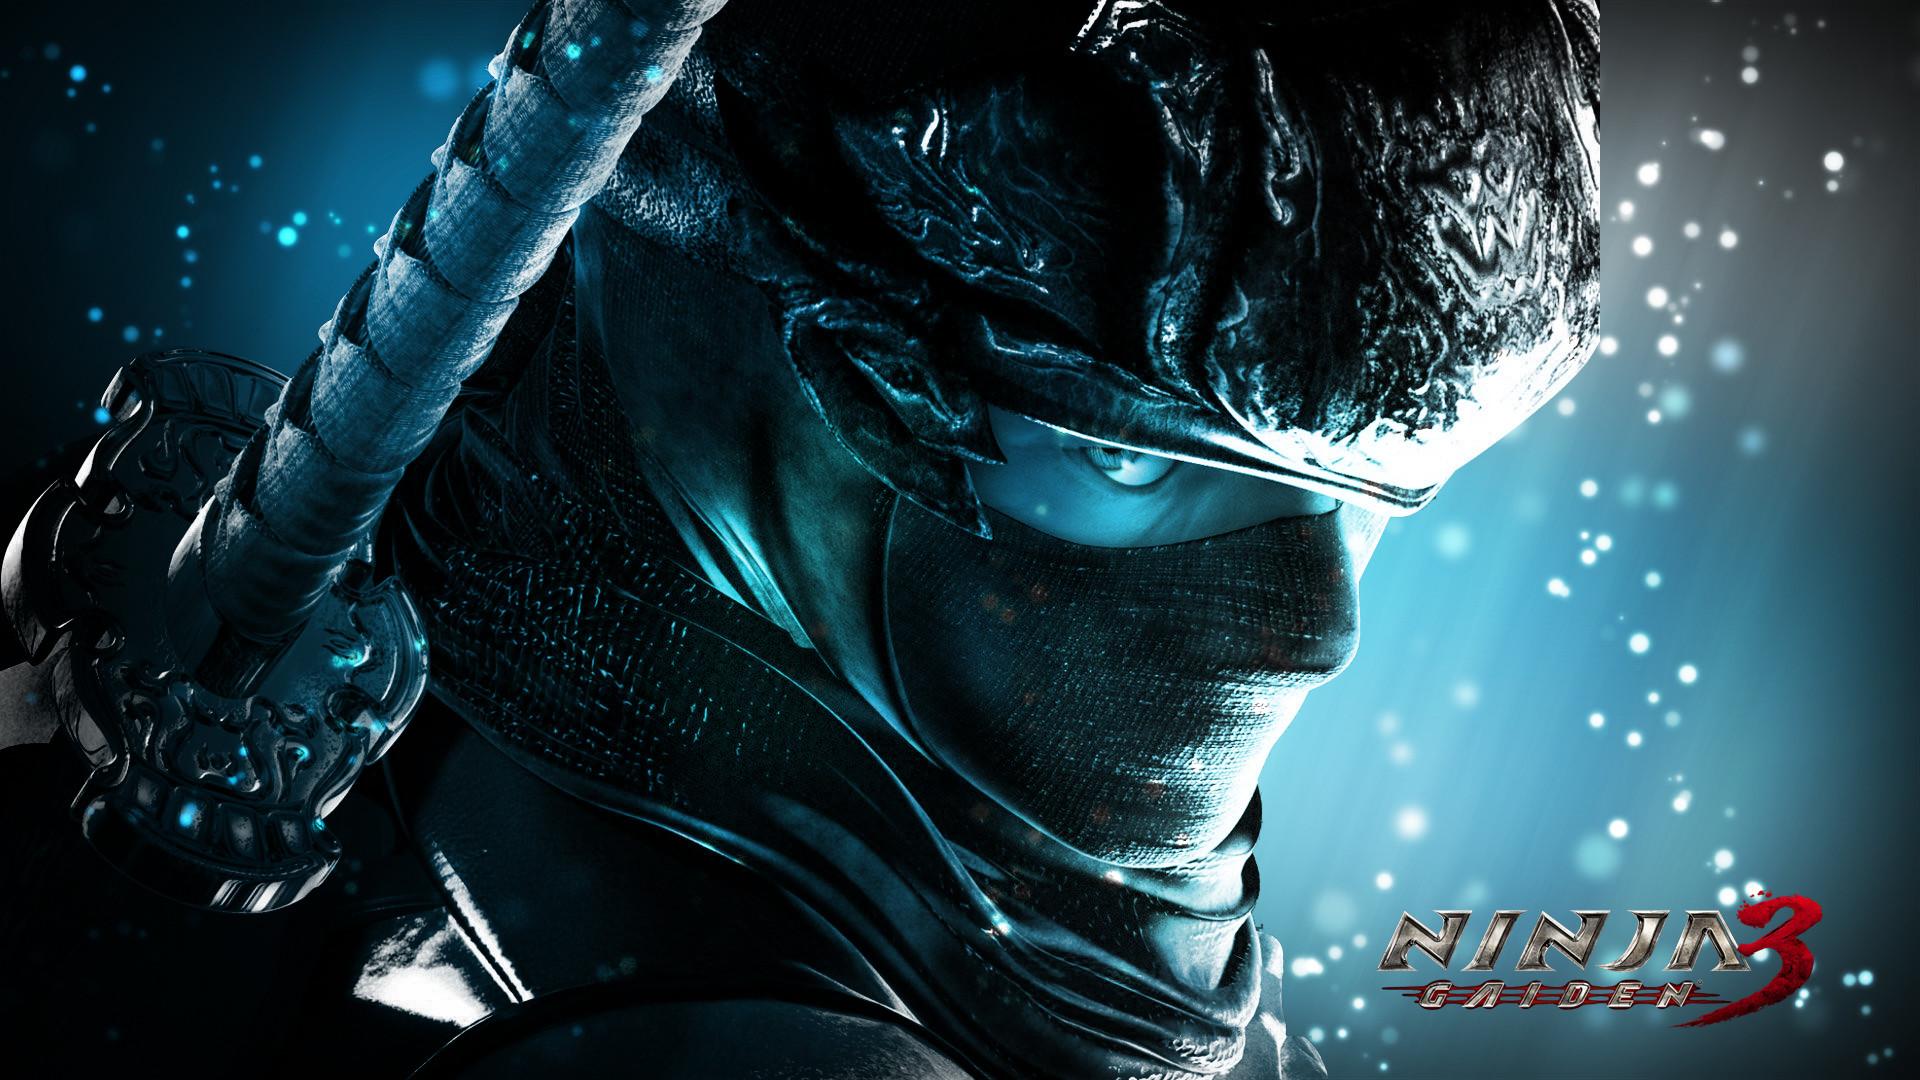 NINJA GAIDEN fantasy anime warrior weapon sword poster f wallpaper      212535   WallpaperUP